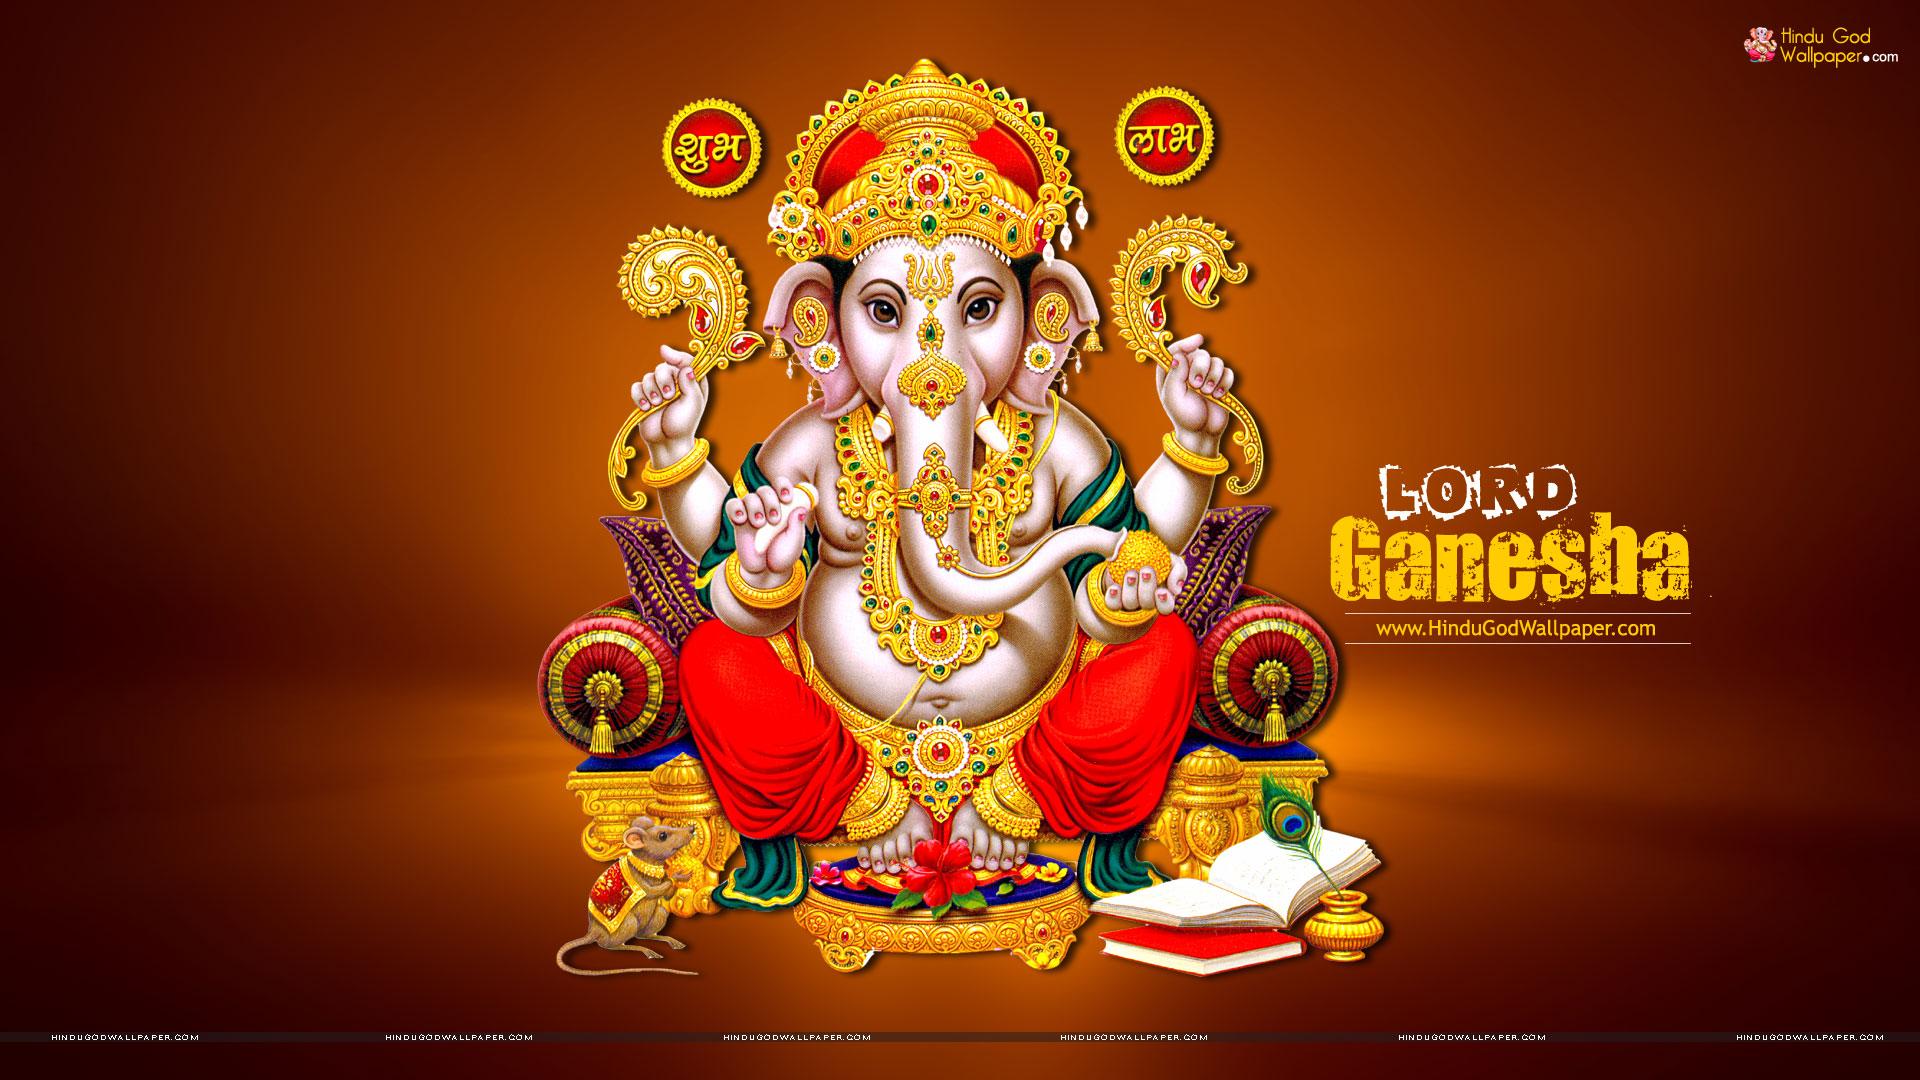 Lord Ganesha Wallpaper X Hd Wallpapers P Hd Wallpapers